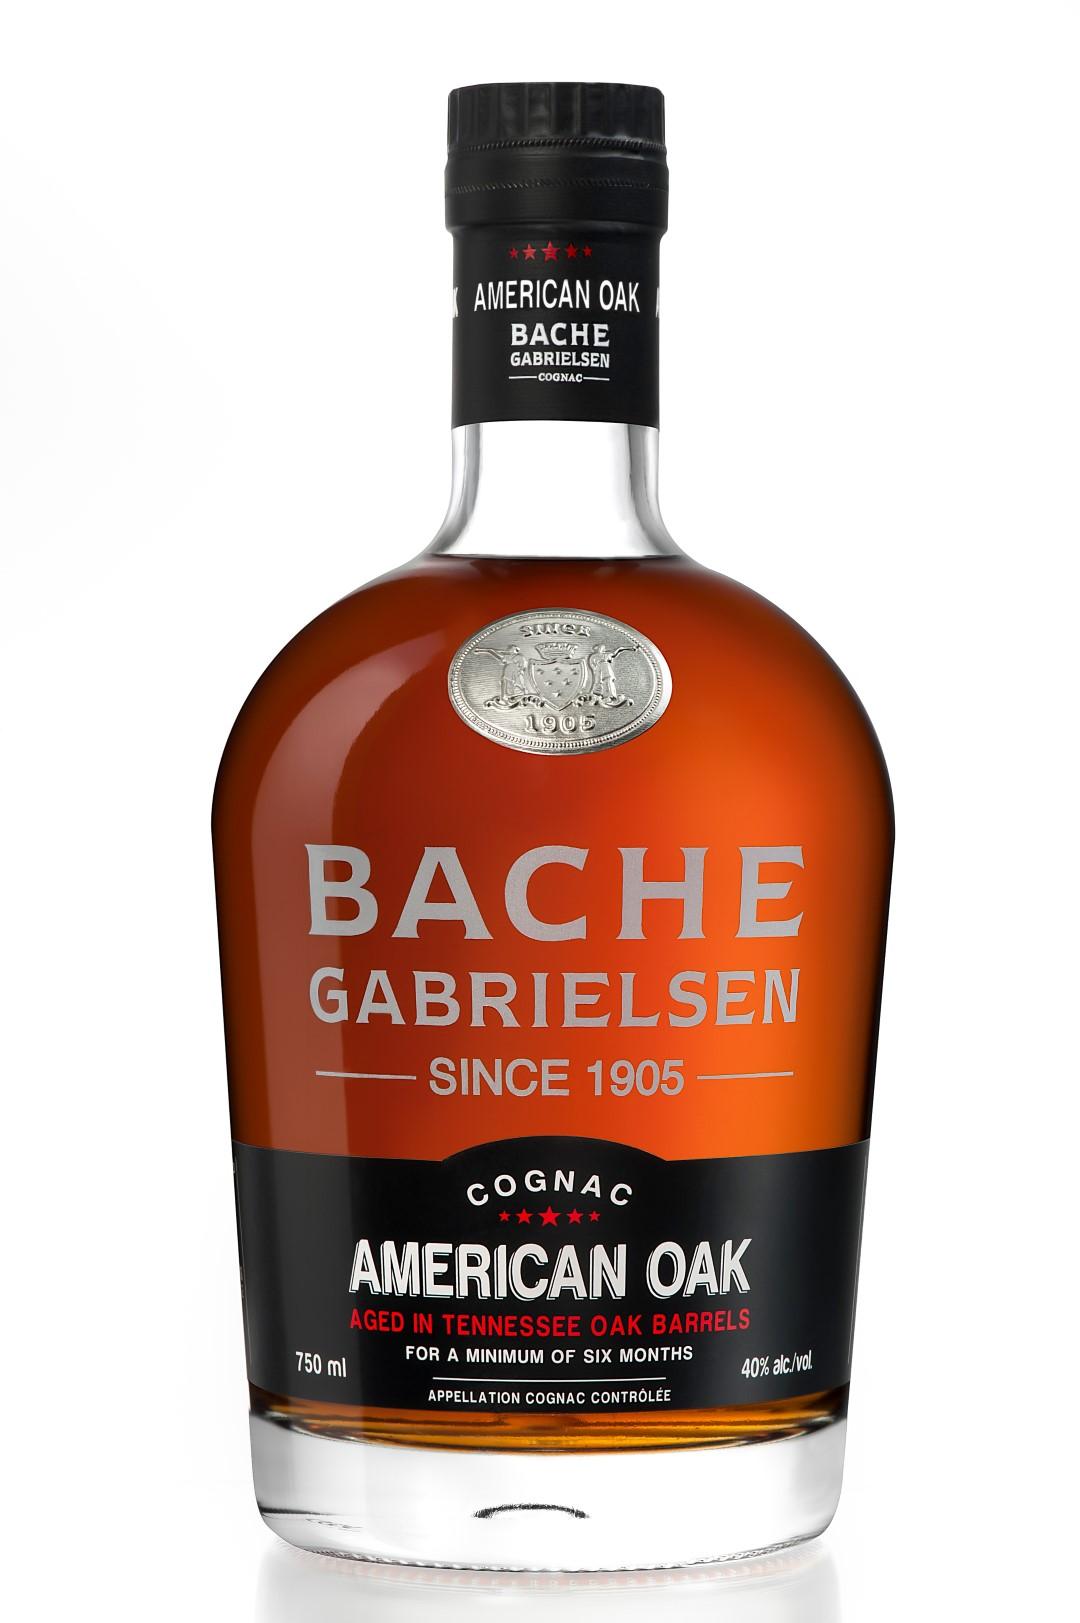 Bache-Gabrielsen American Oak Cognac